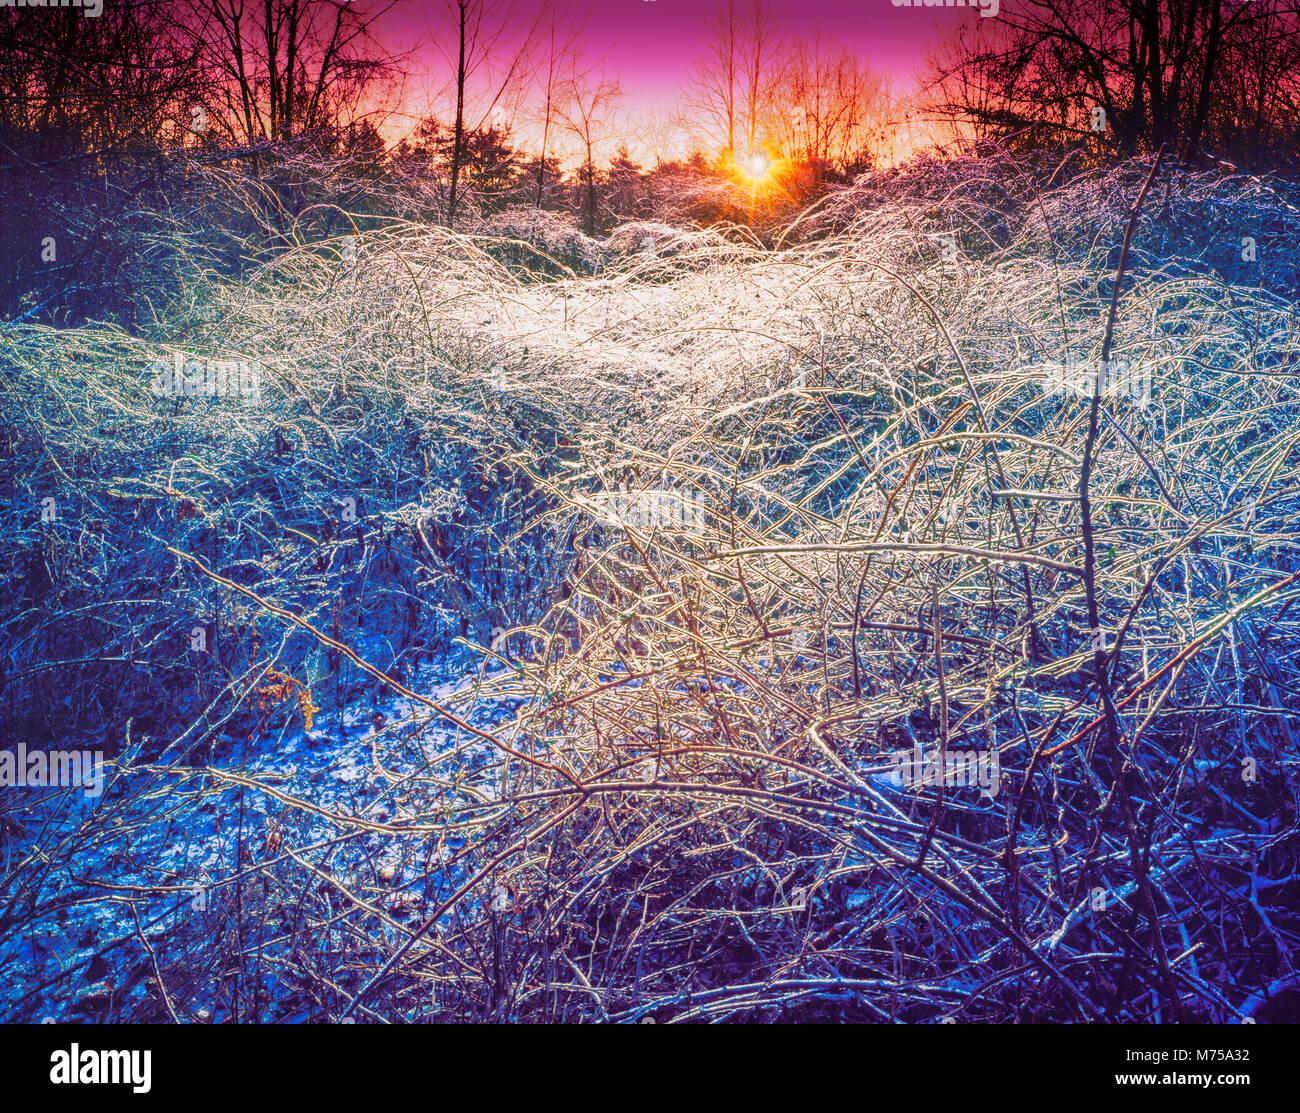 Bosque cubierto de hielo, Watchung Rservation, montañas Watchung New Jersey Foto de stock